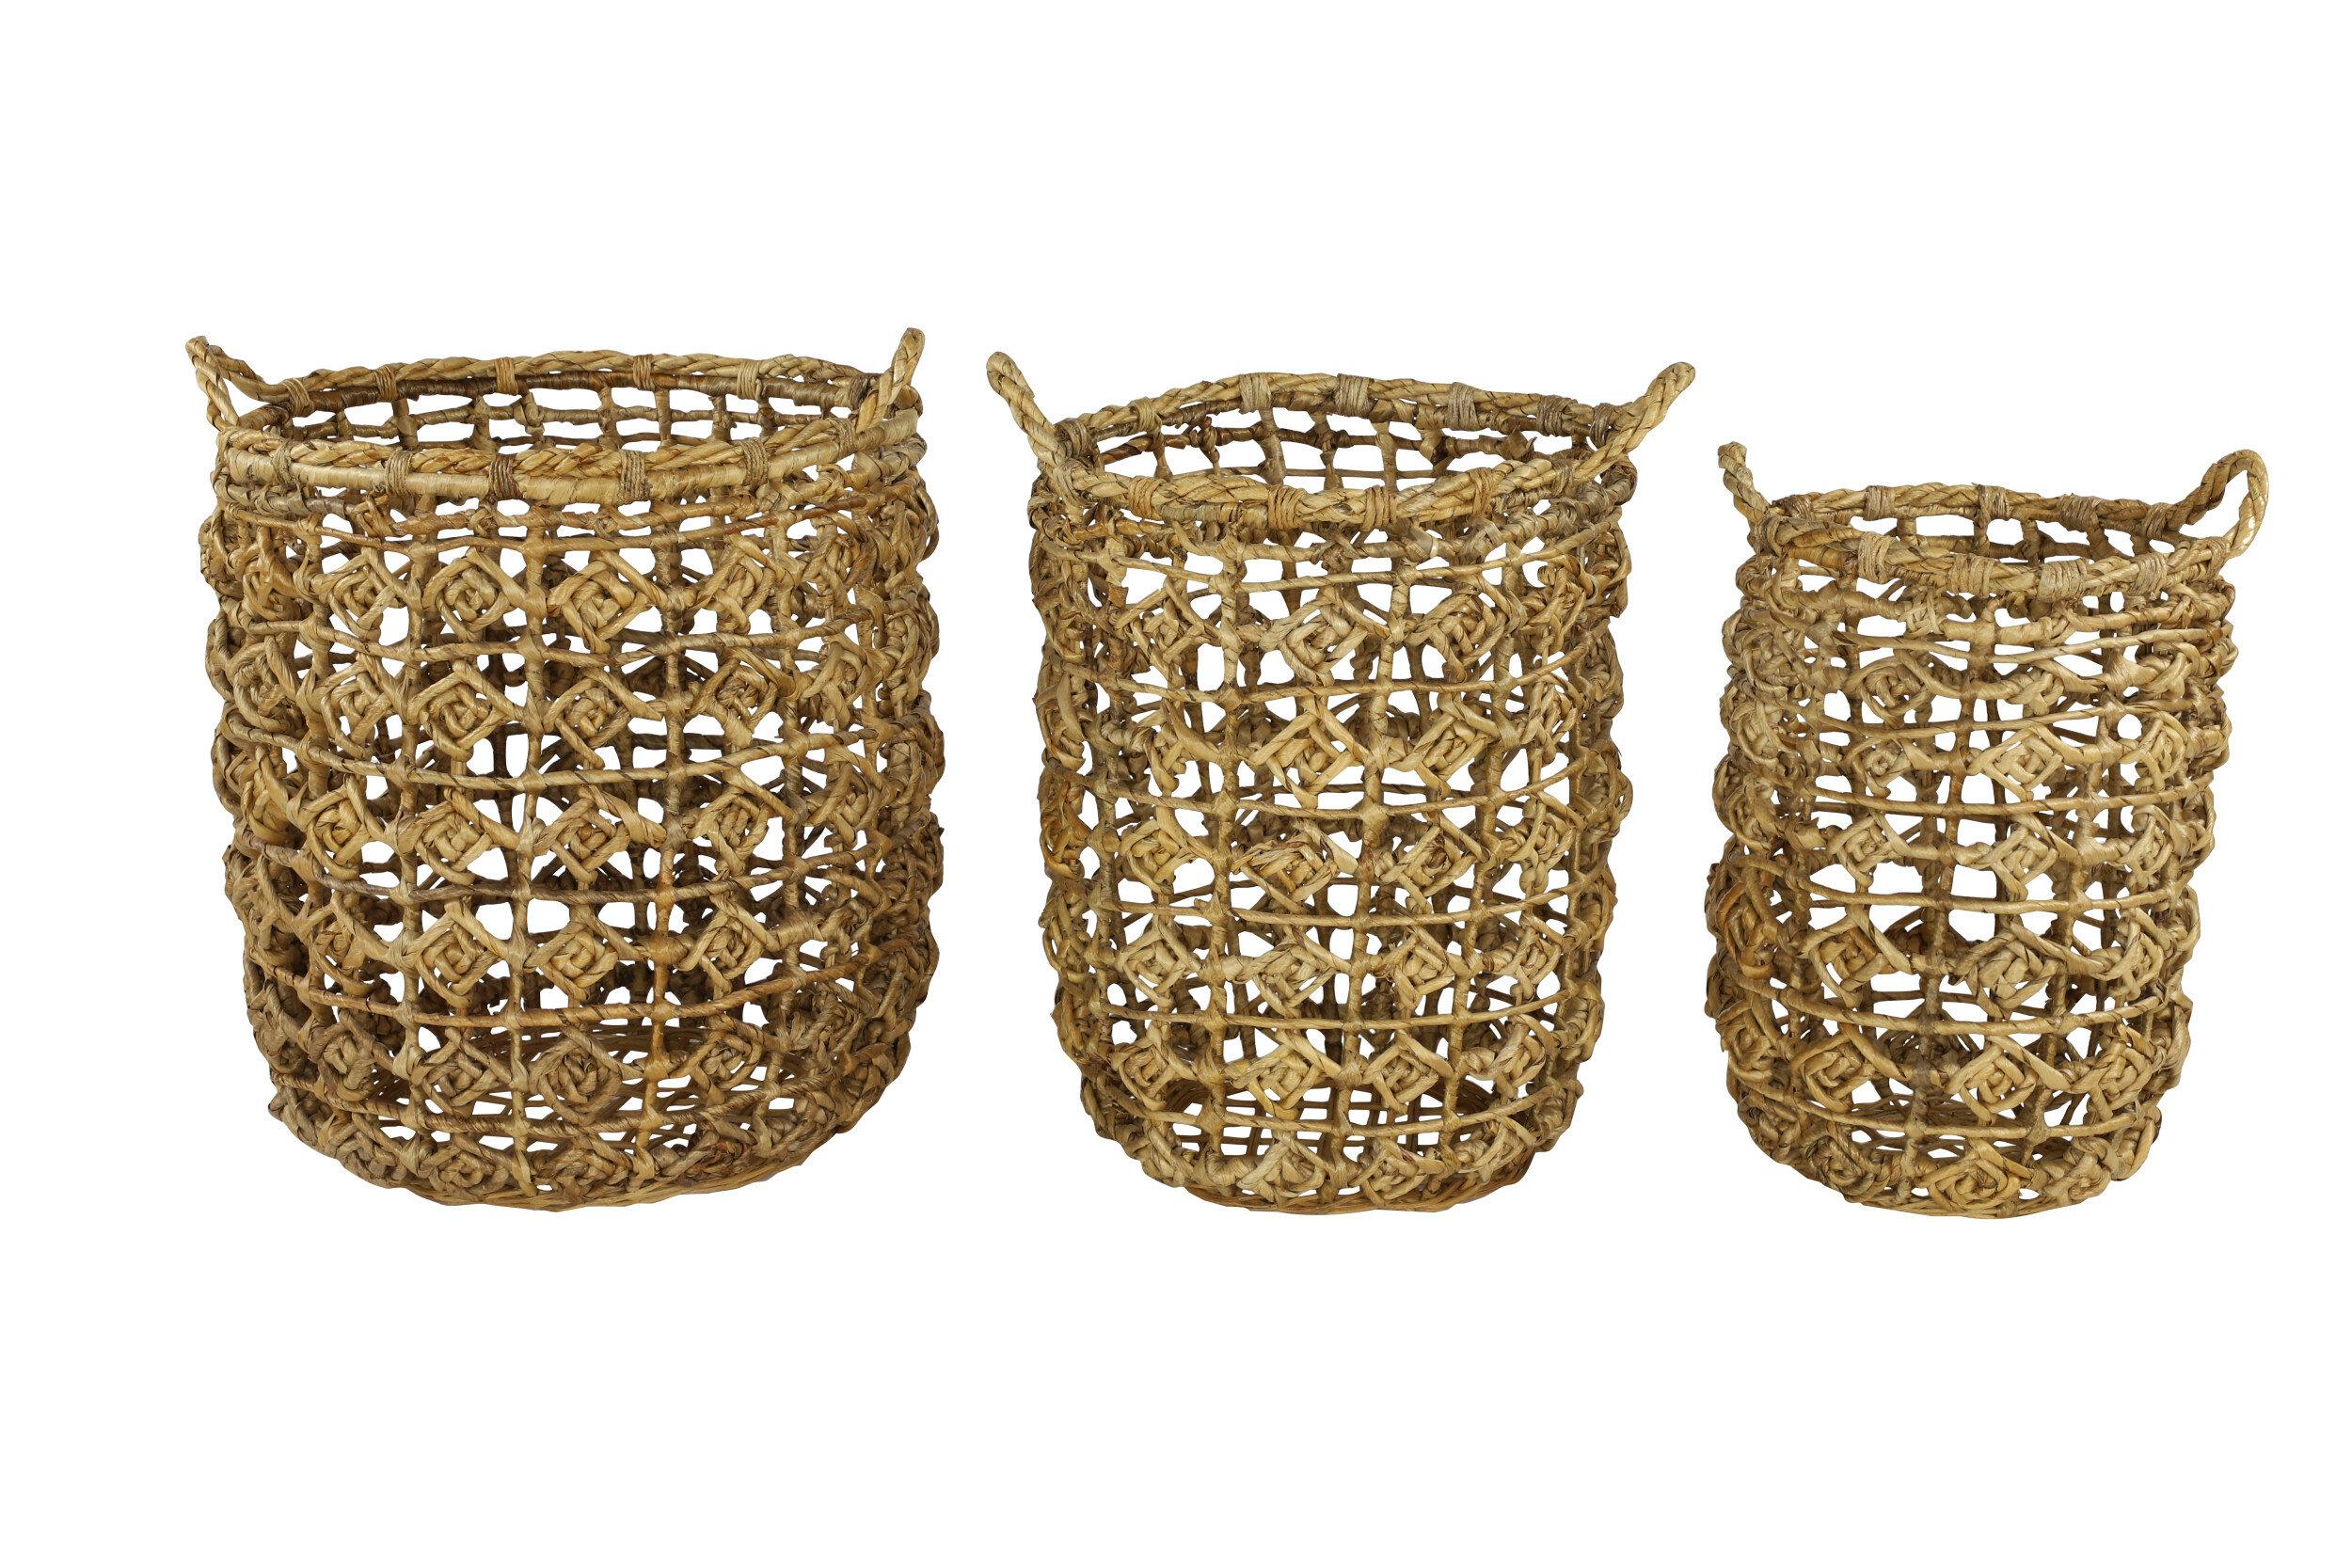 3 Piece Wicker Rattan Basket Set Allmodern